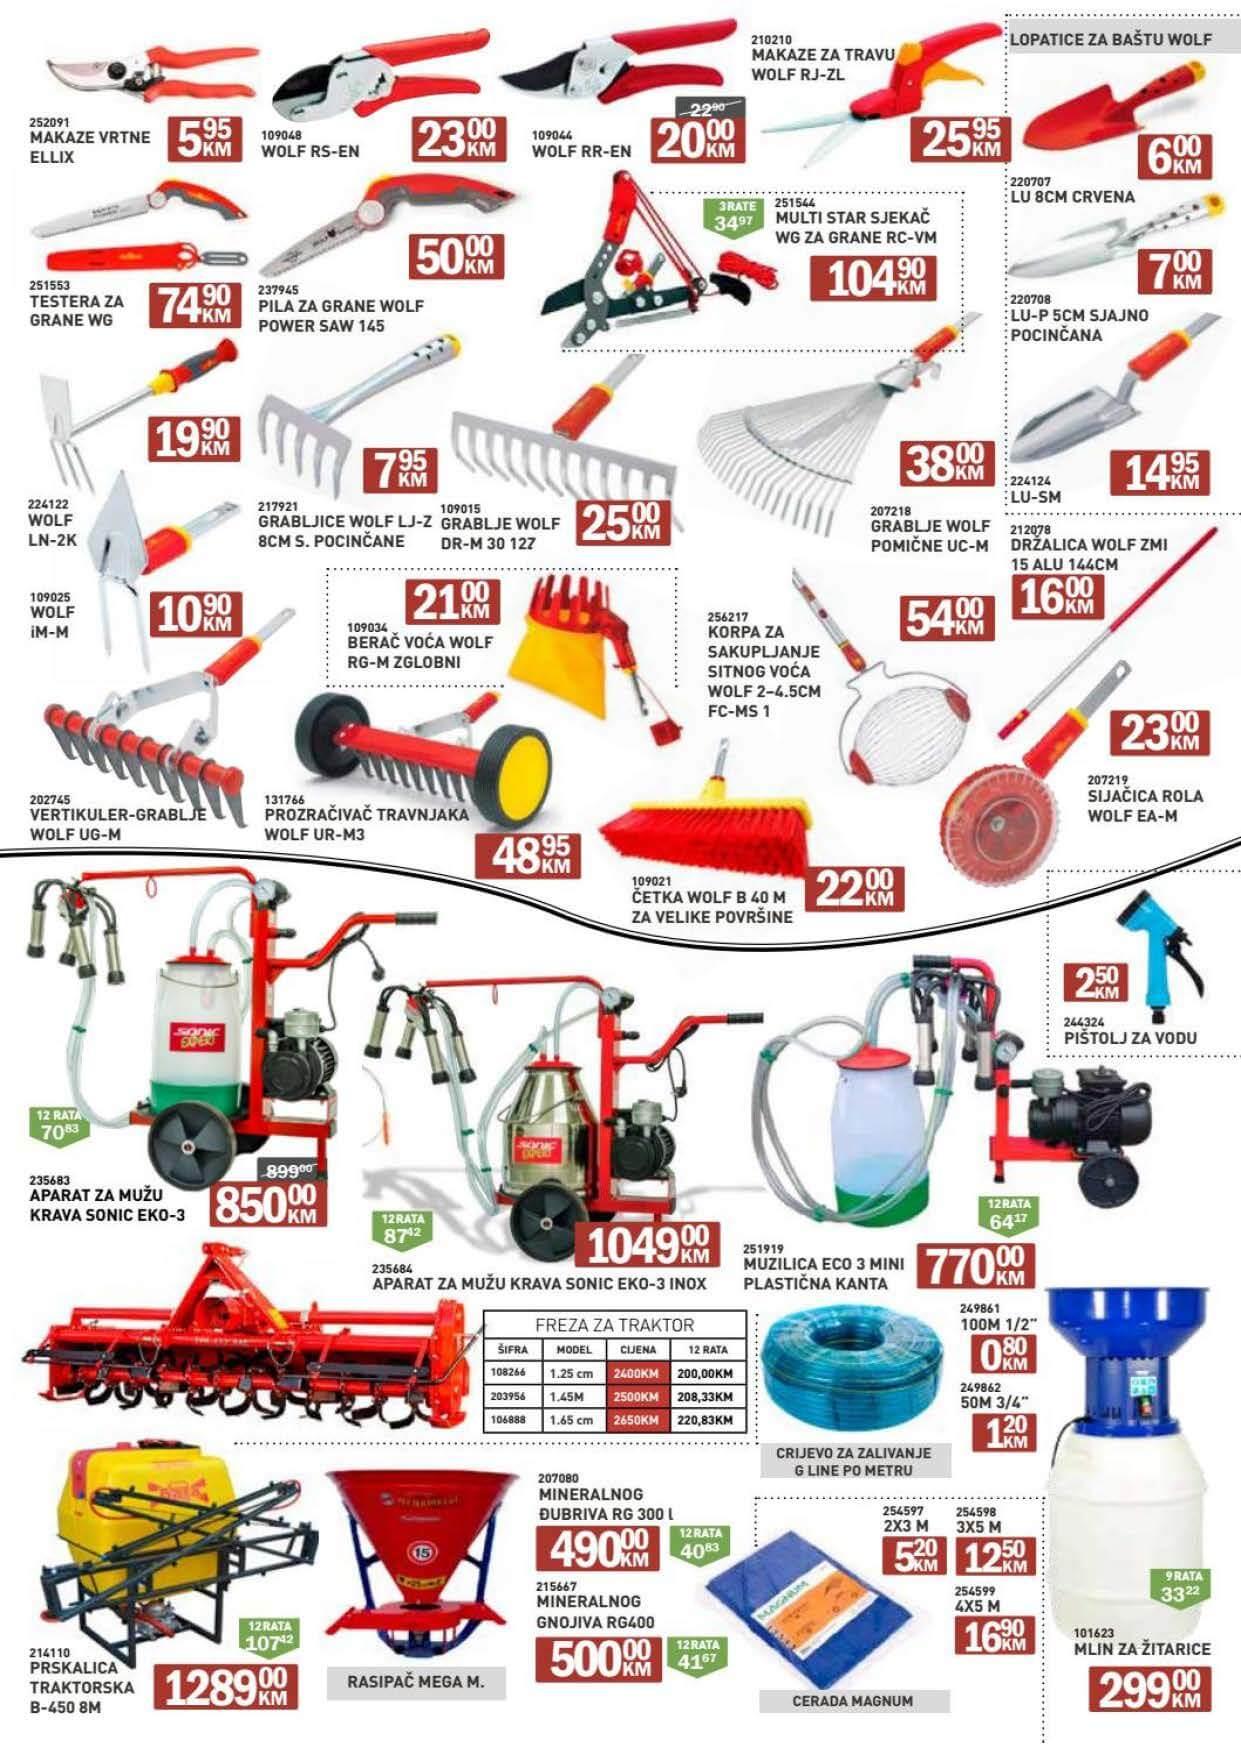 Verno Agromehanika Akcijski Katalog JUN 2021 eKatalozi.com PR Page 12